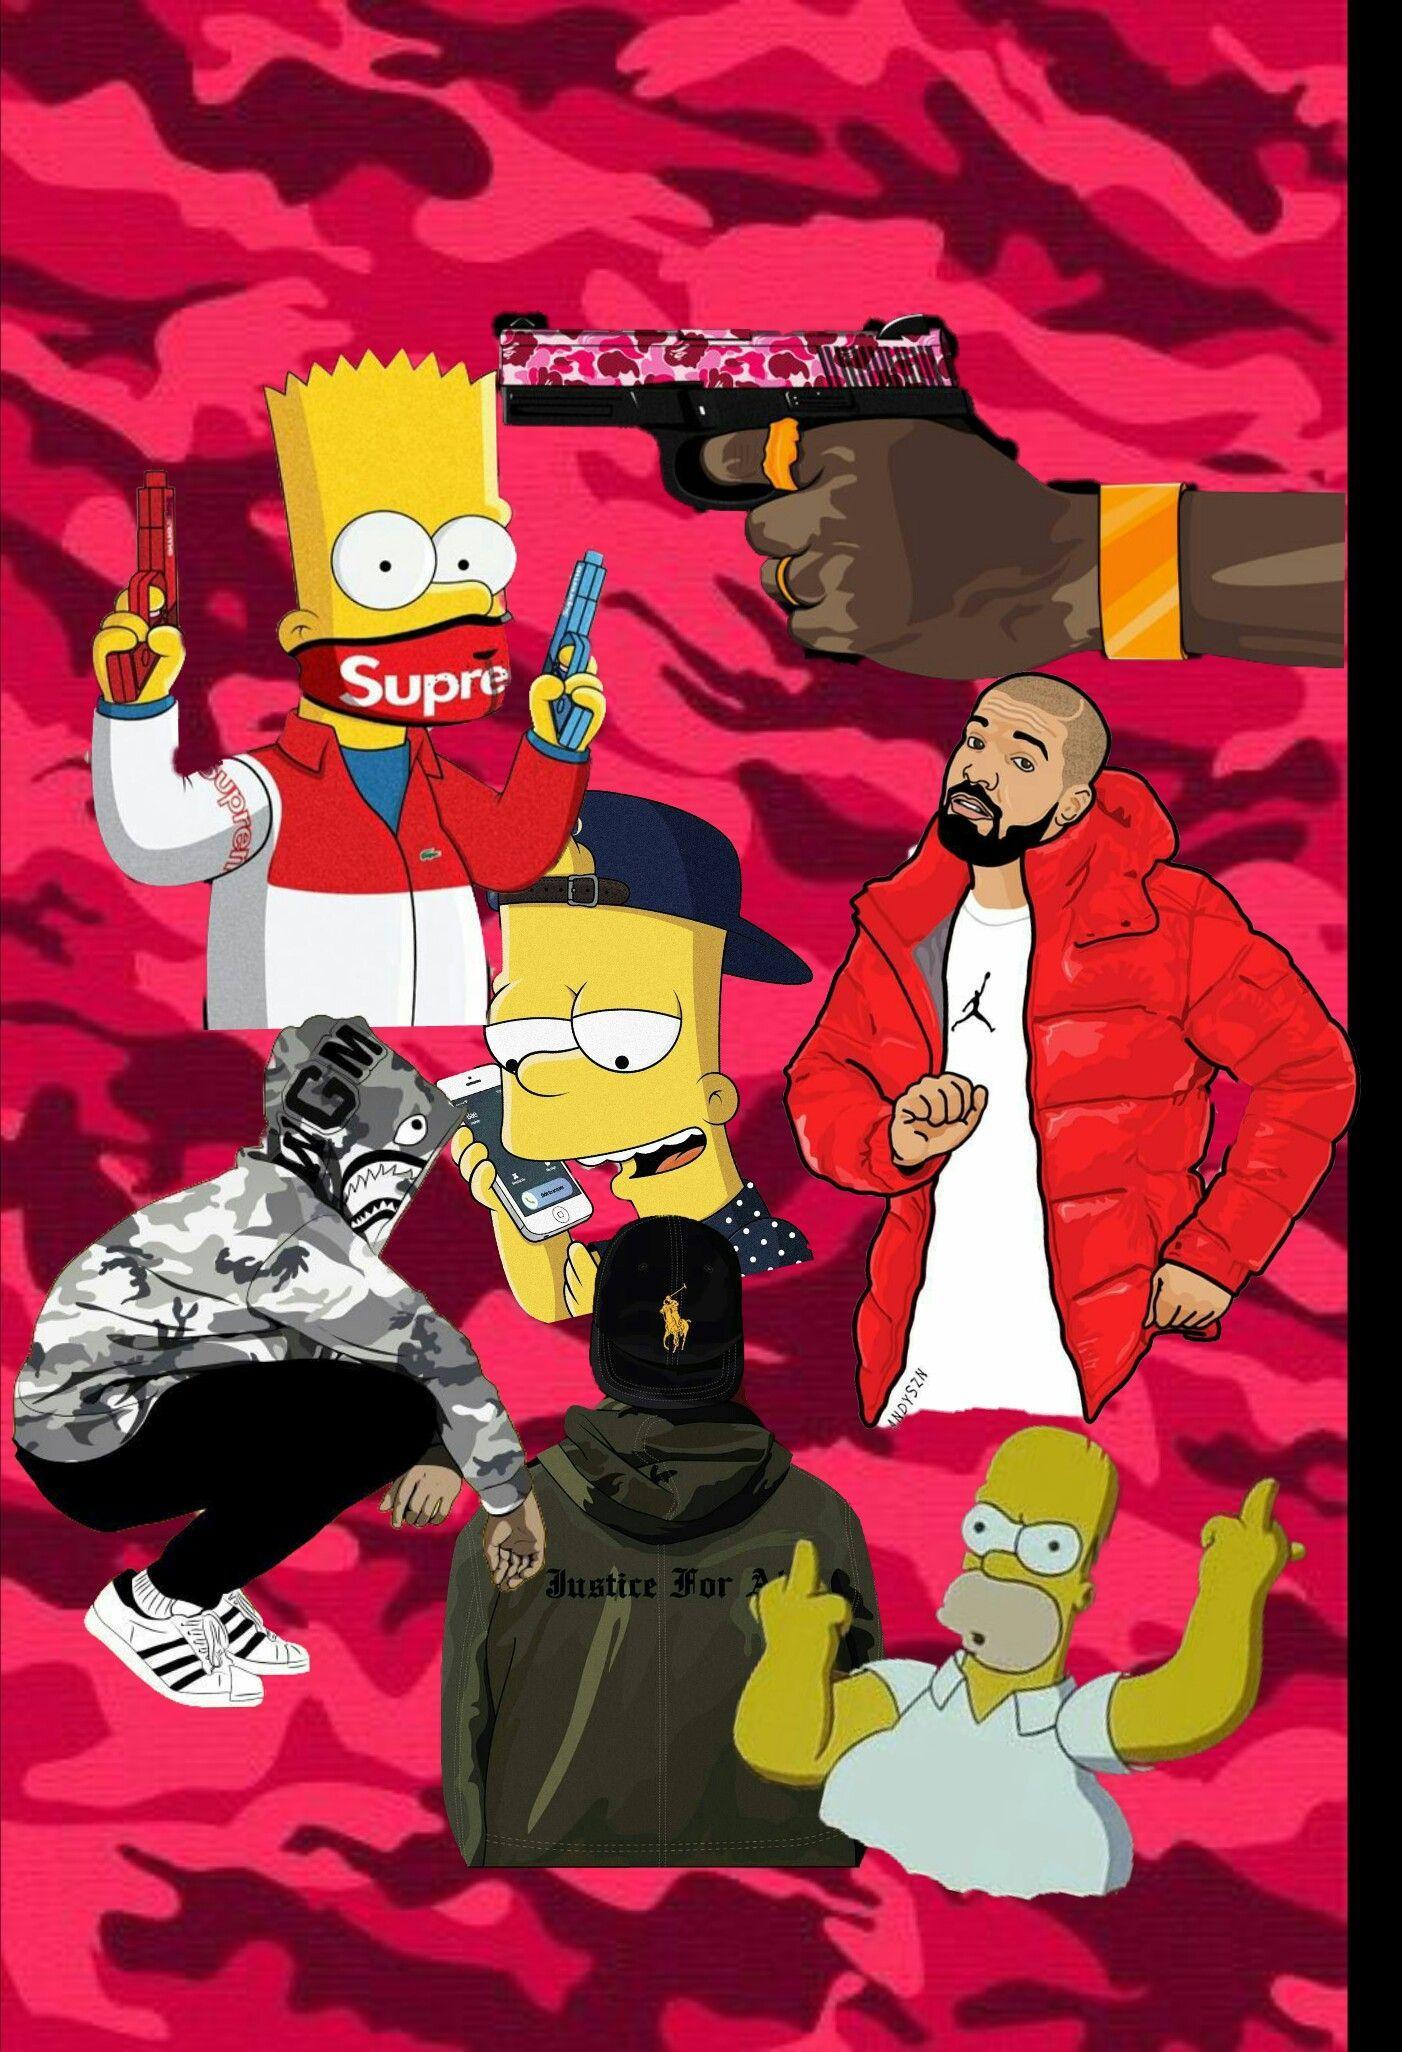 Wallpaper - Bape Bart Simpson - HD Wallpaper